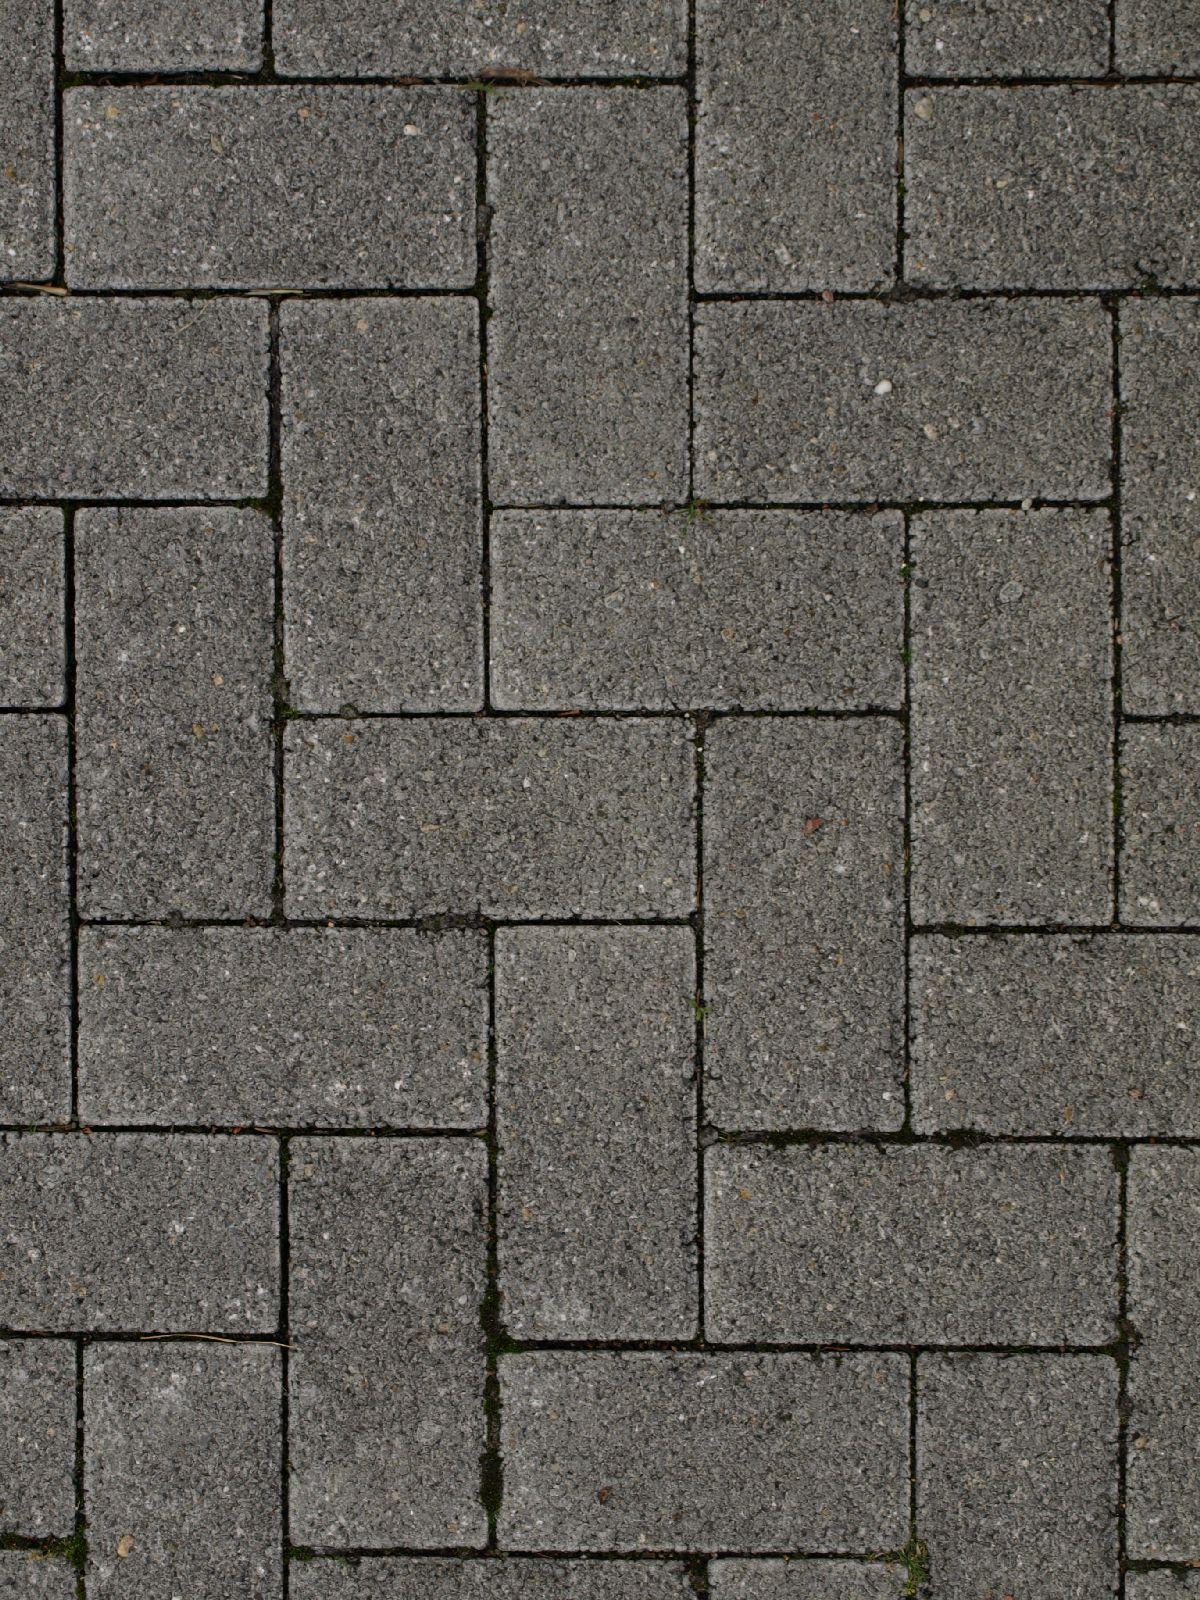 Ground-Urban_Texture_A_PA045740